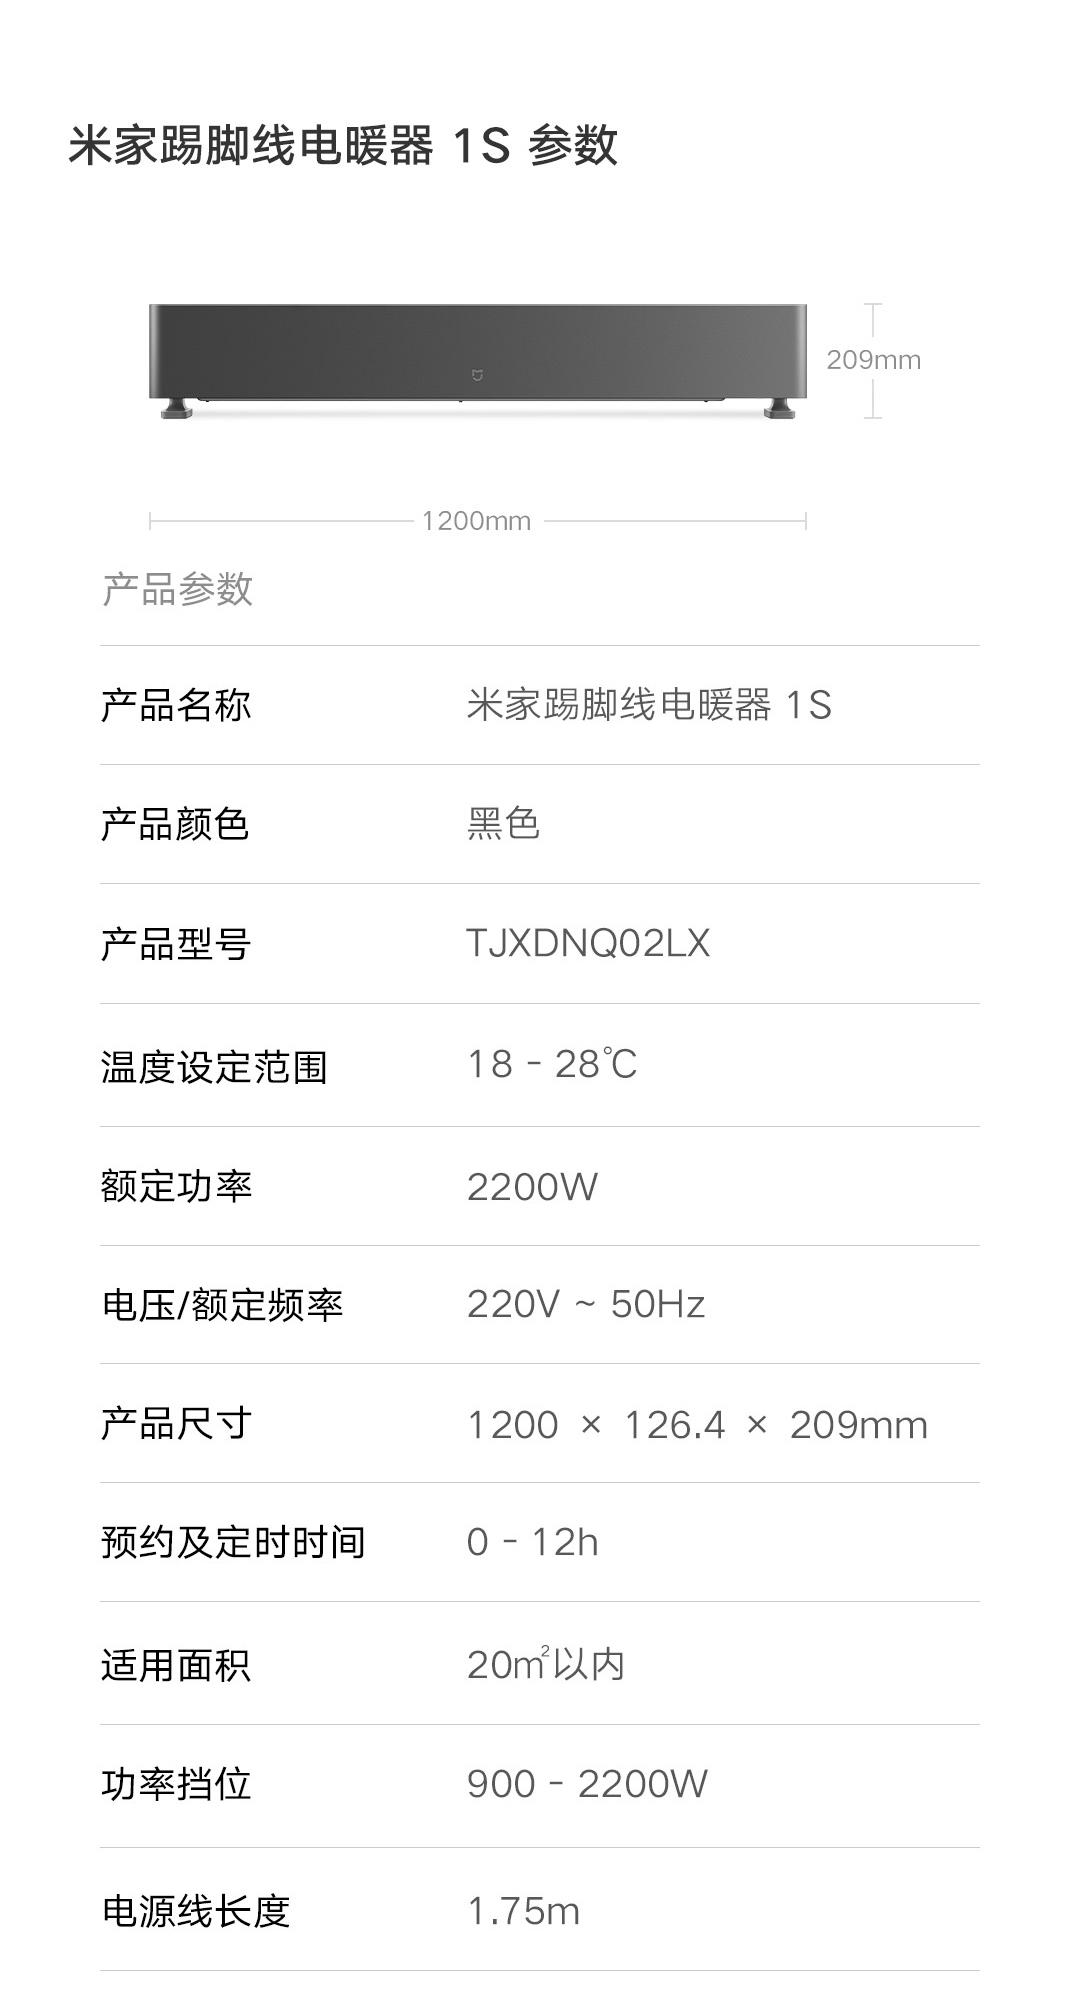 1600x_image.png?1600164861